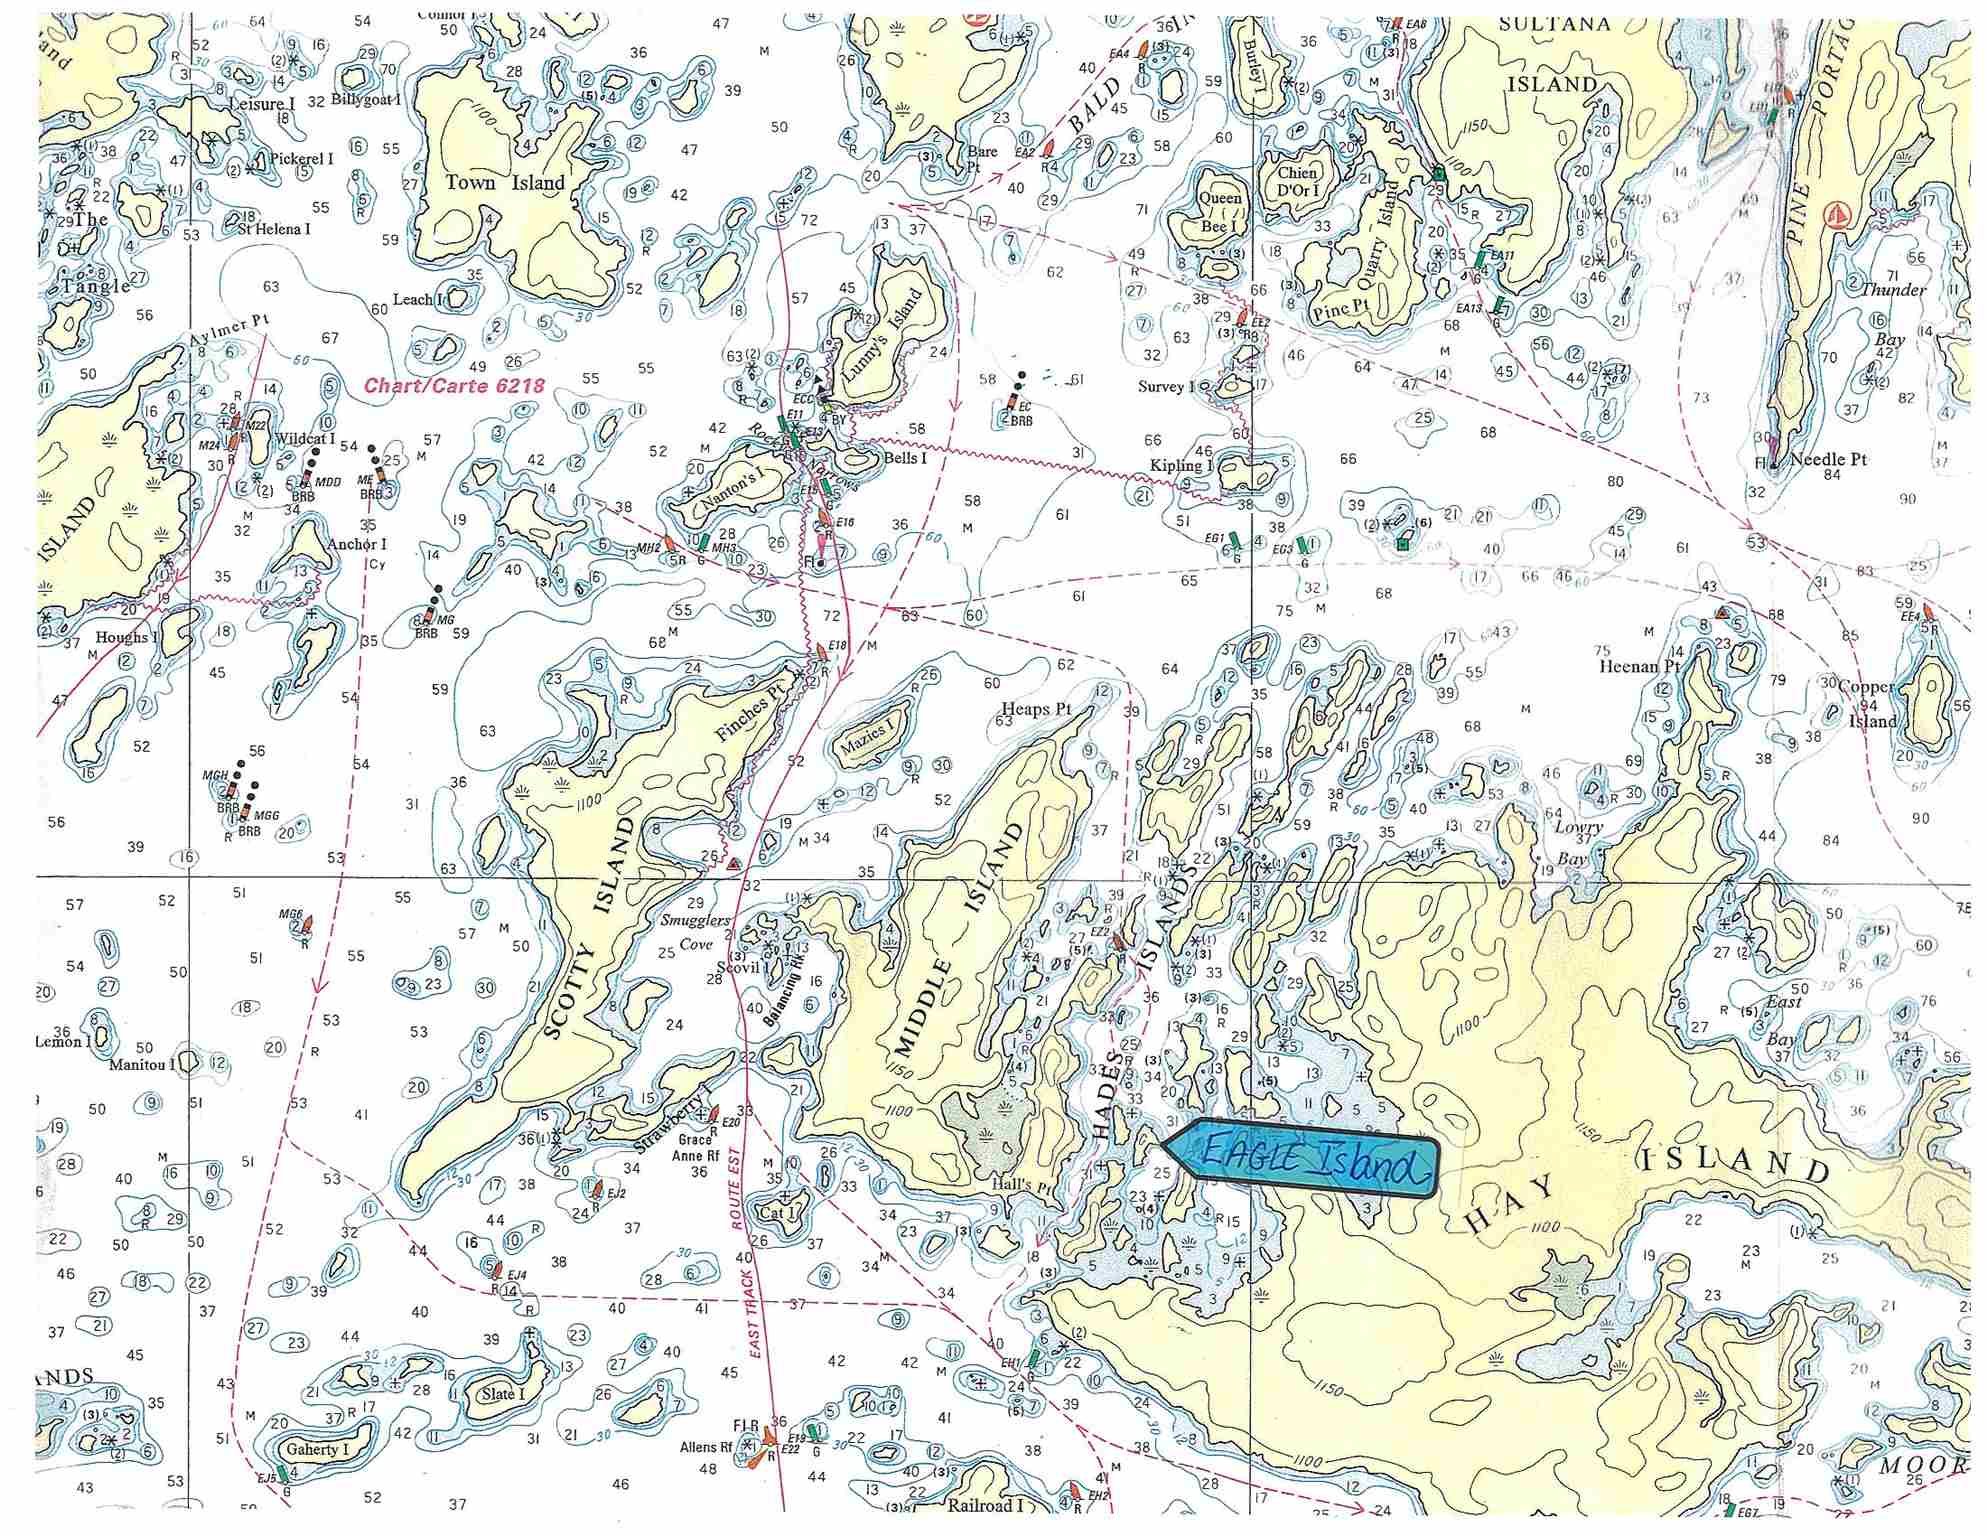 Island G830 The Hades, Lake of the Woods (ID TB190598)